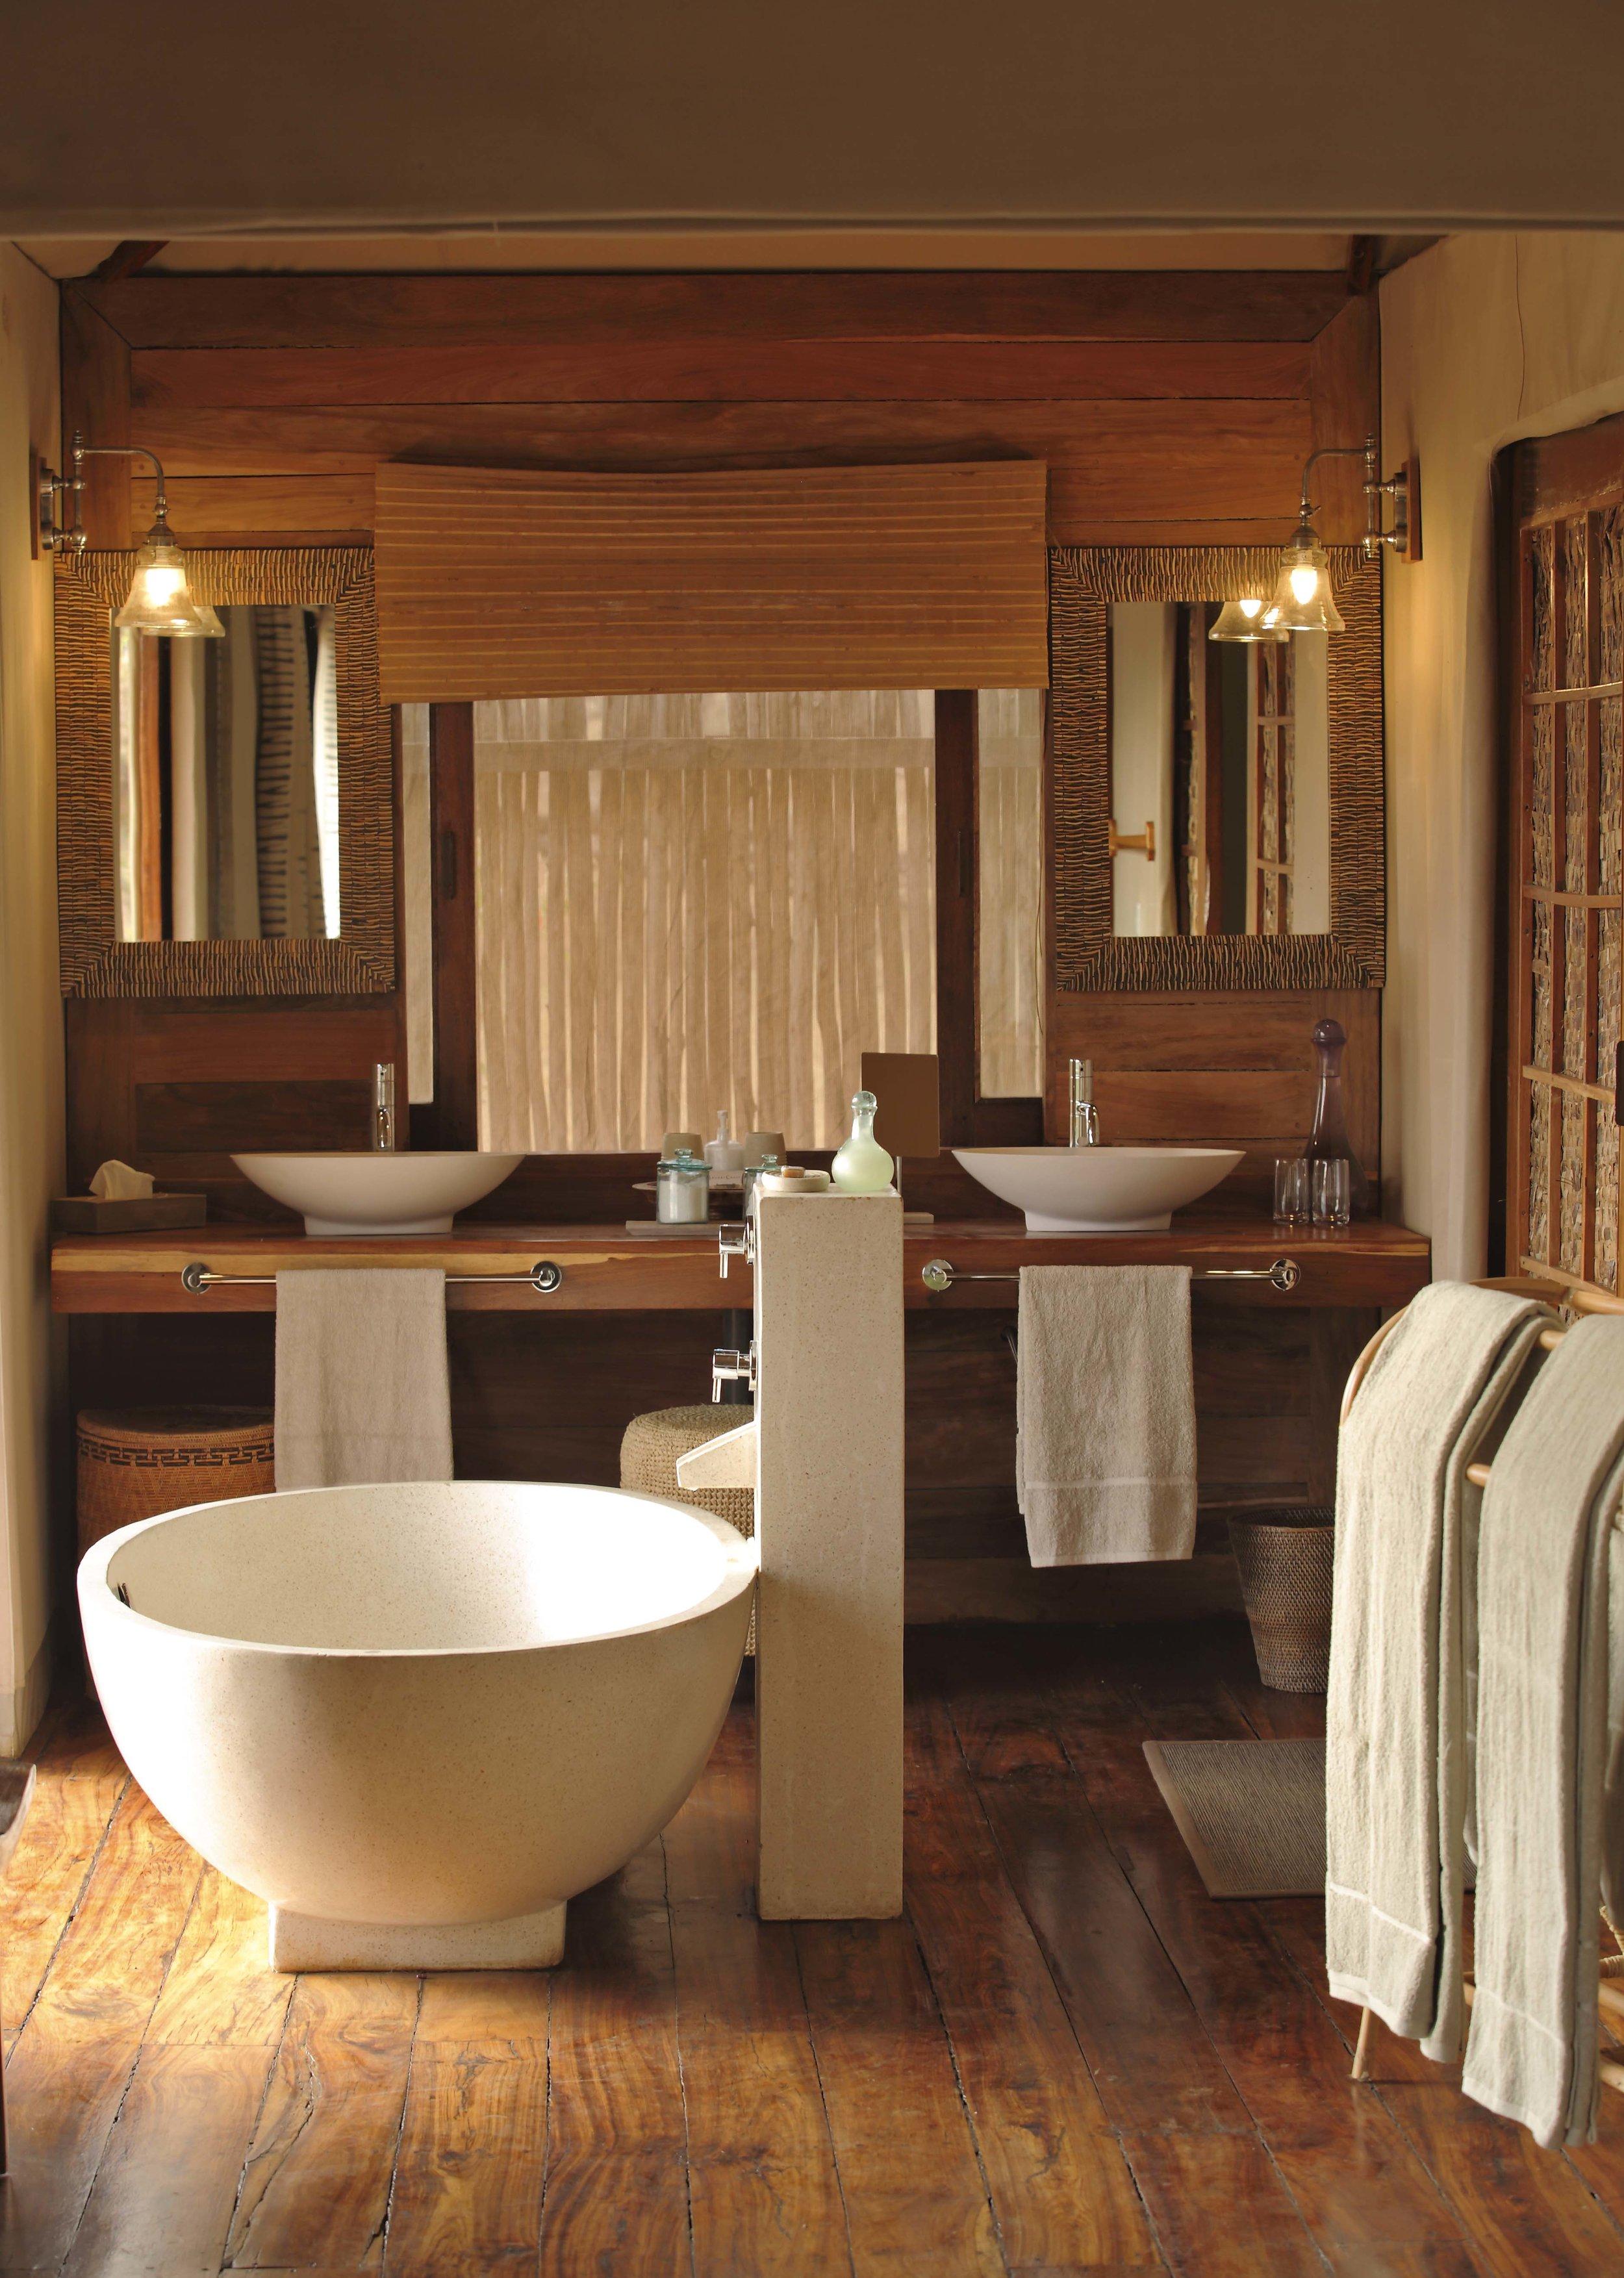 Sayari-bathroom-bathtub.jpg